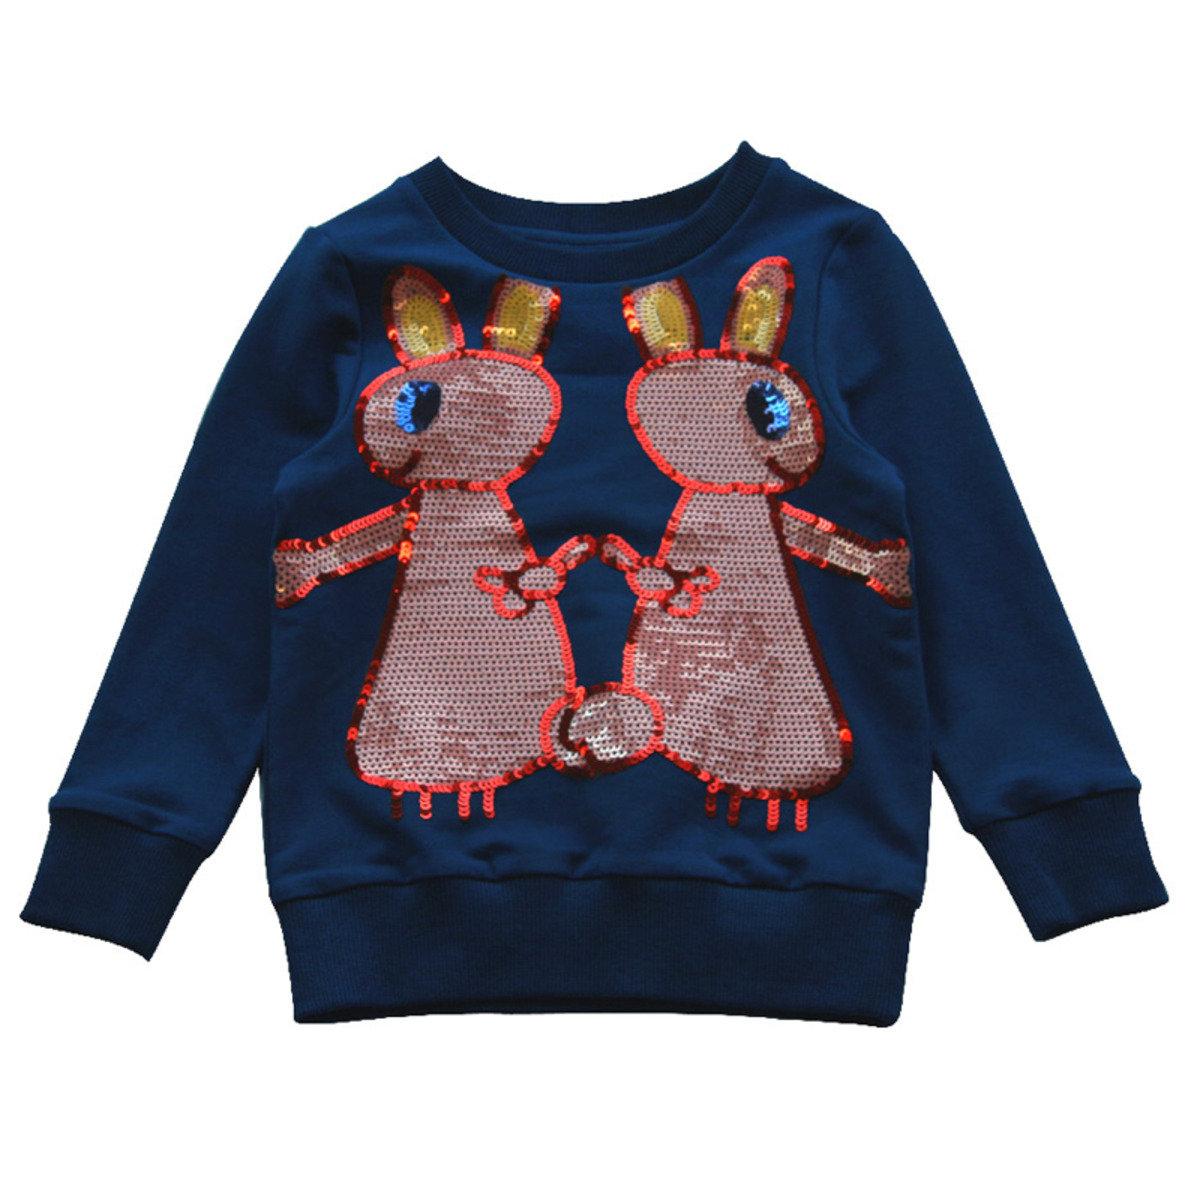 Lovie可愛珠片小兔衛衣(藍色)